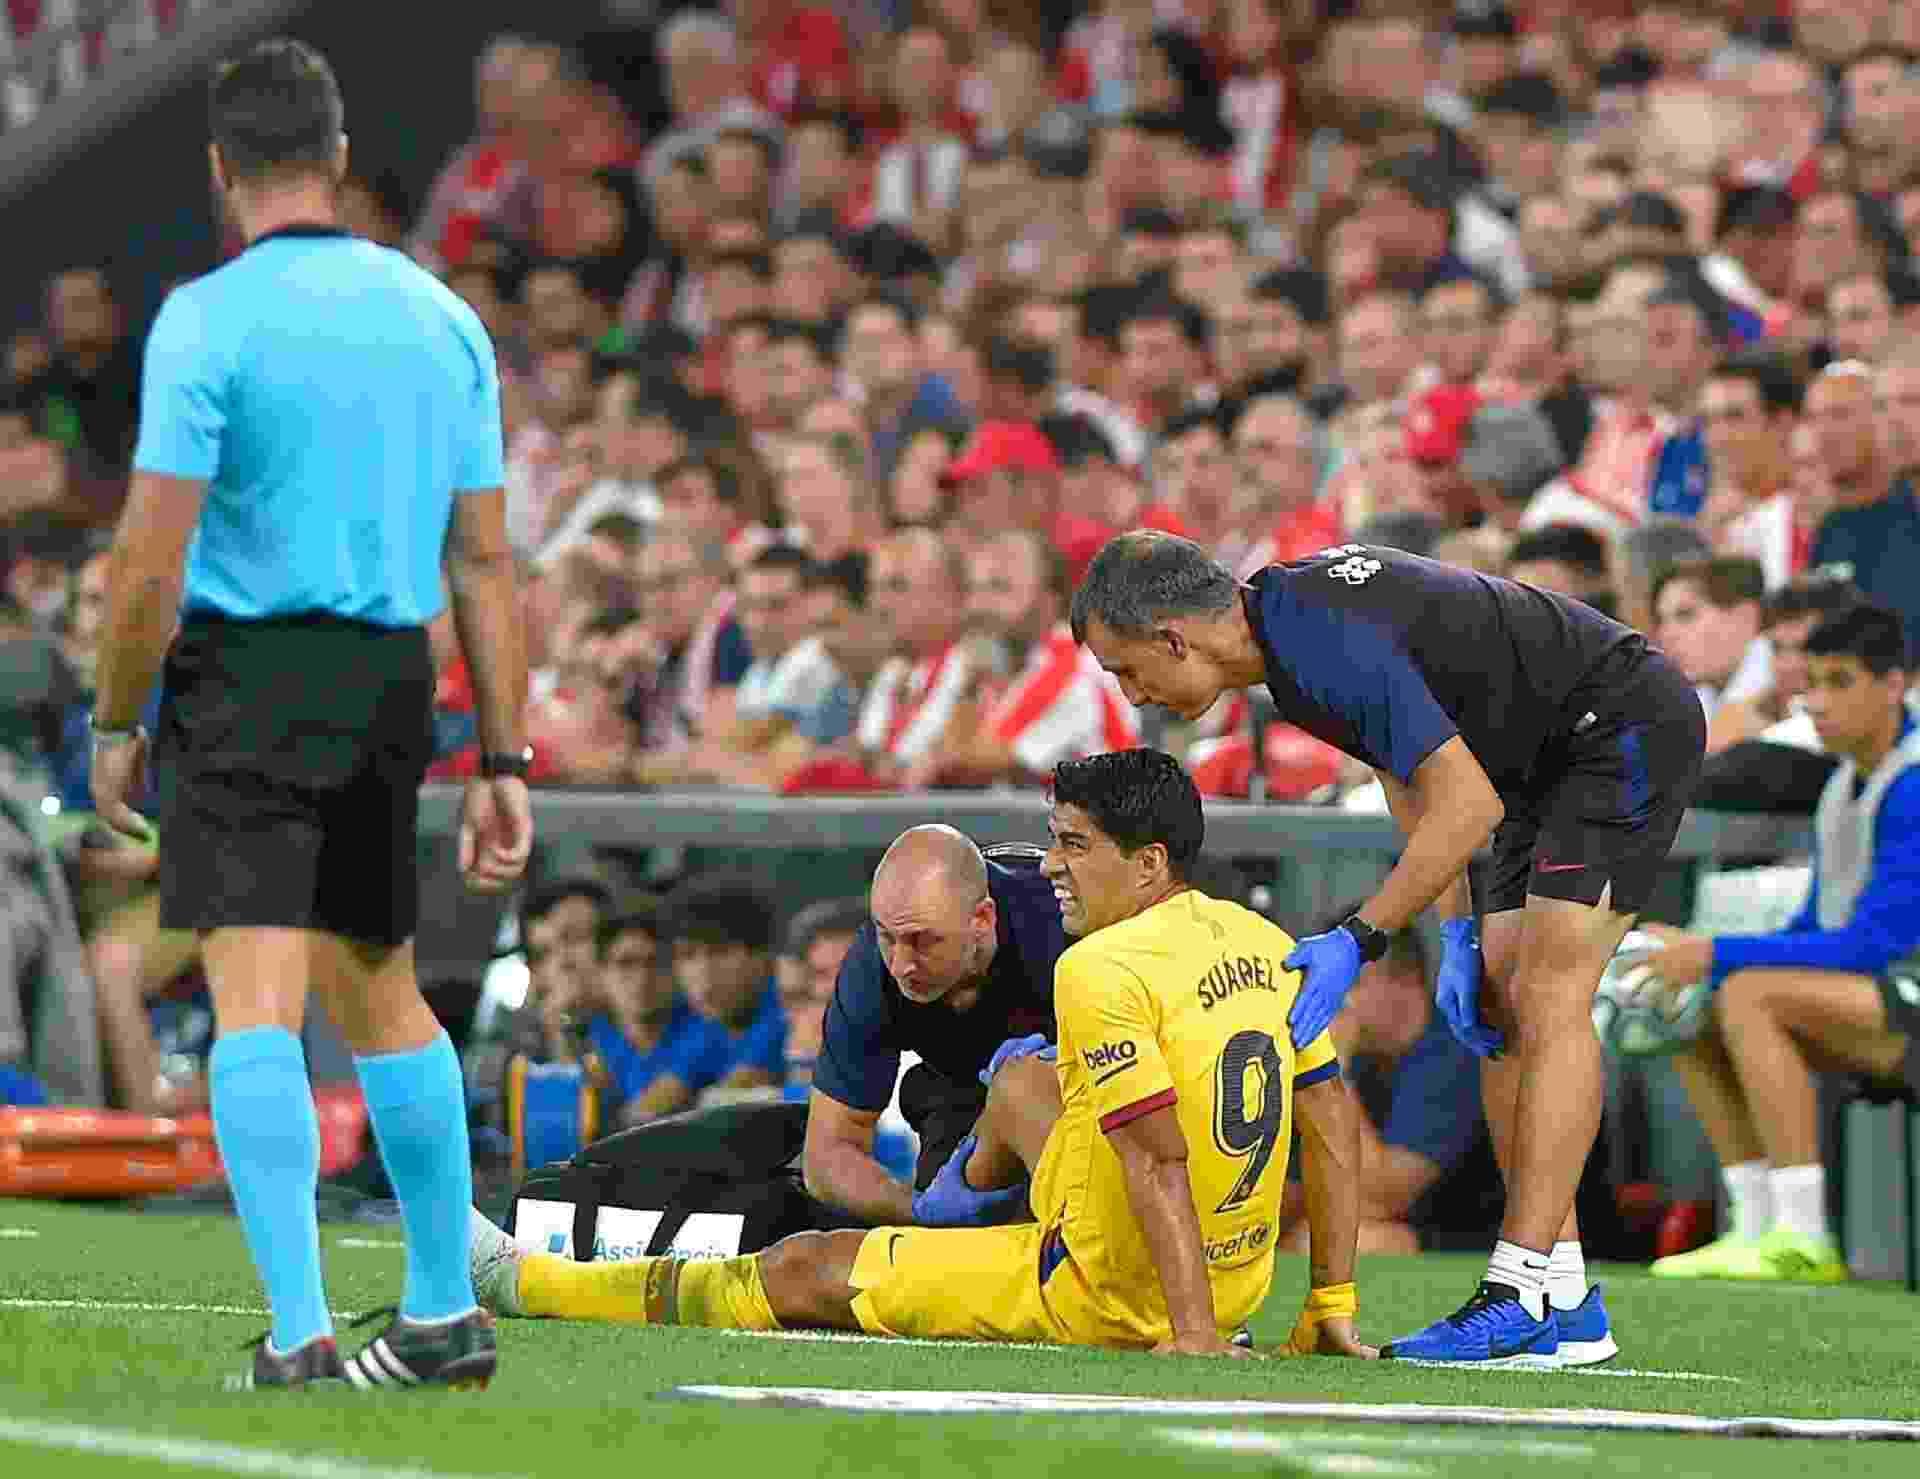 Luis Suárez sai lesionado da partida entre Athletic Bilbao x Barcelona - undefined